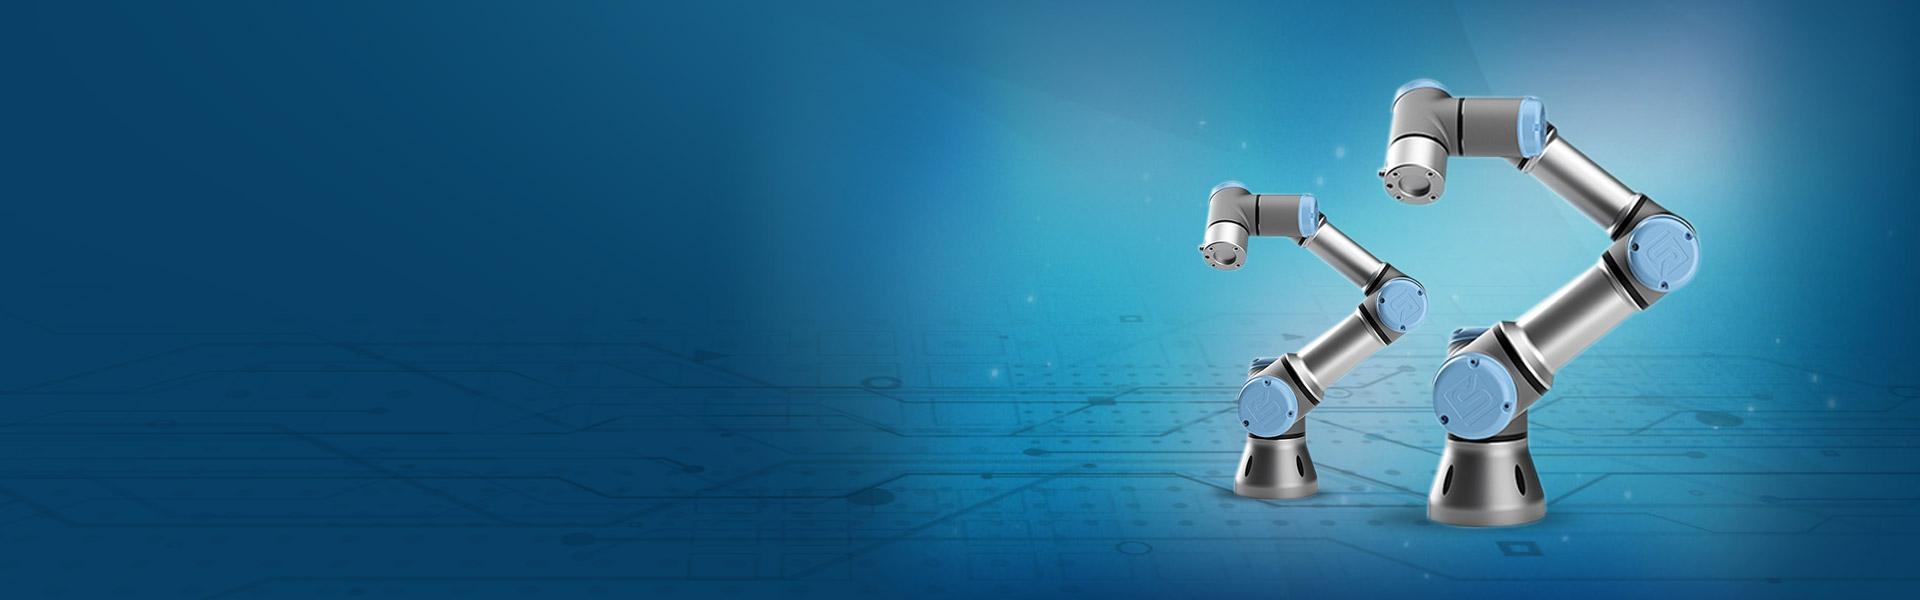 Logicon Technosolutions Pvt  Ltd  - Industrial Automation